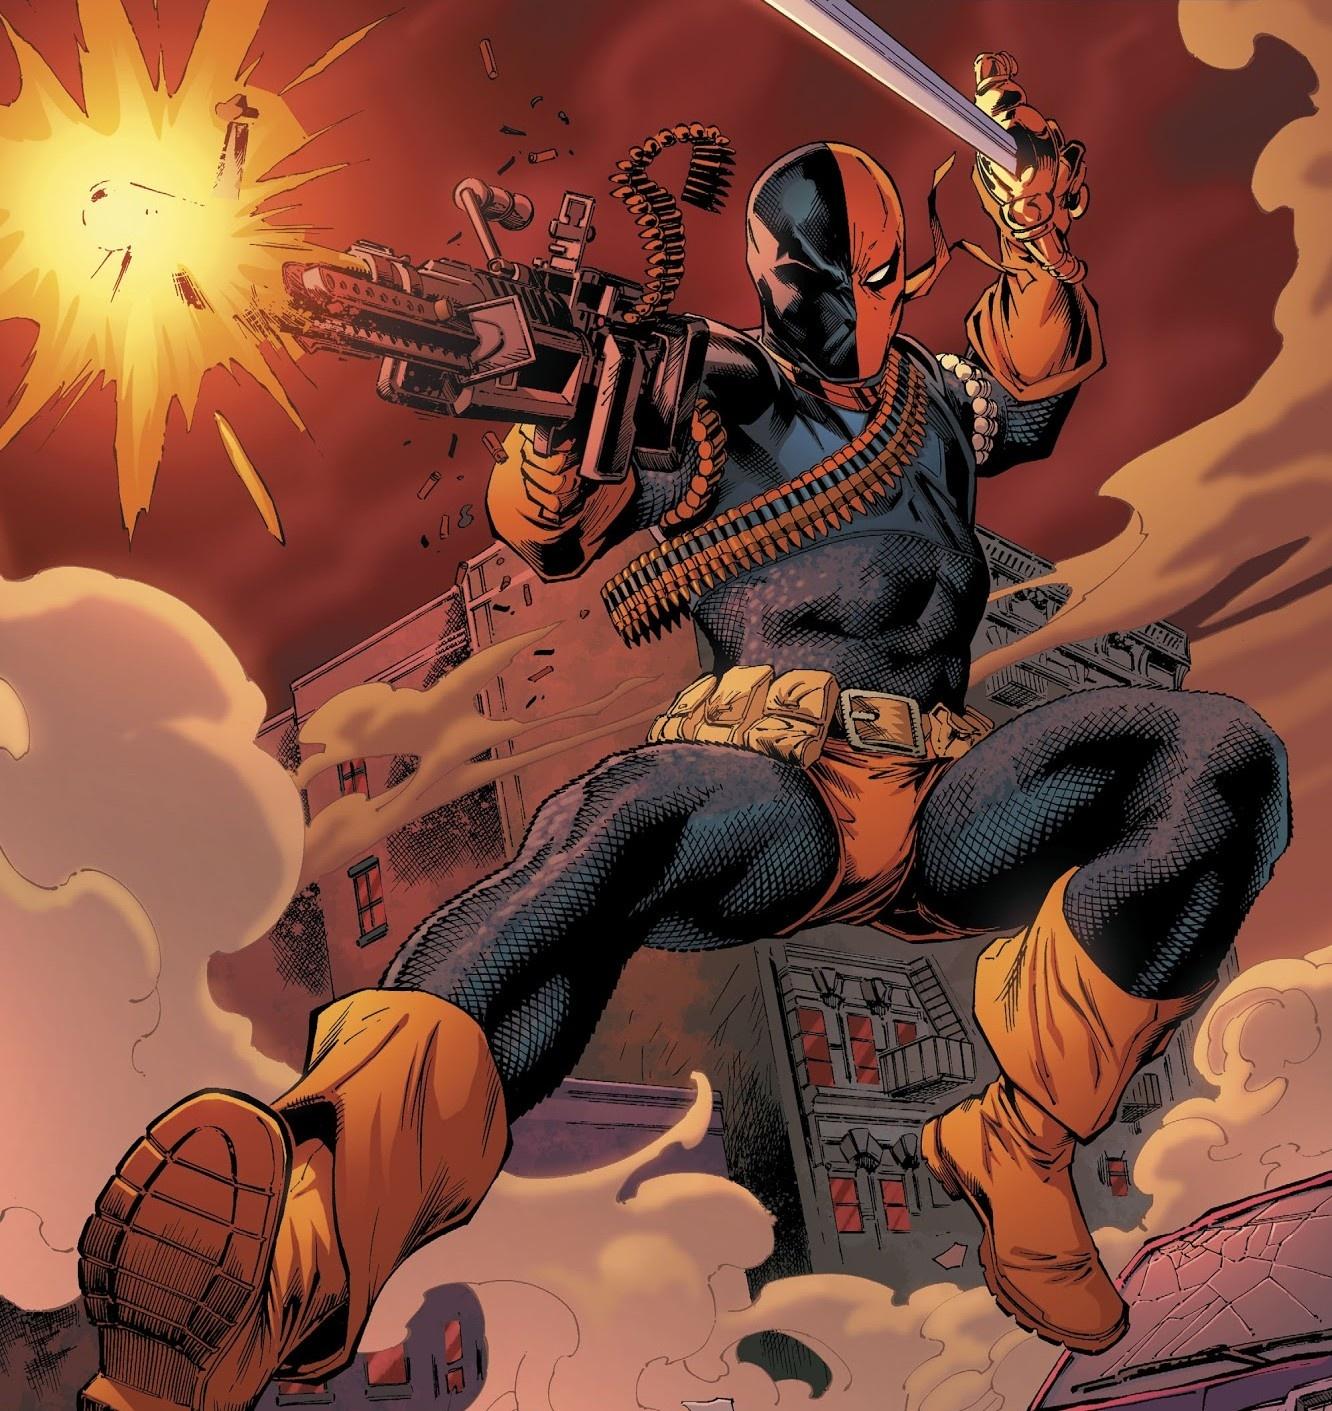 Who would win, Carter Slade (Marvel) vs Slade Wilson (DC